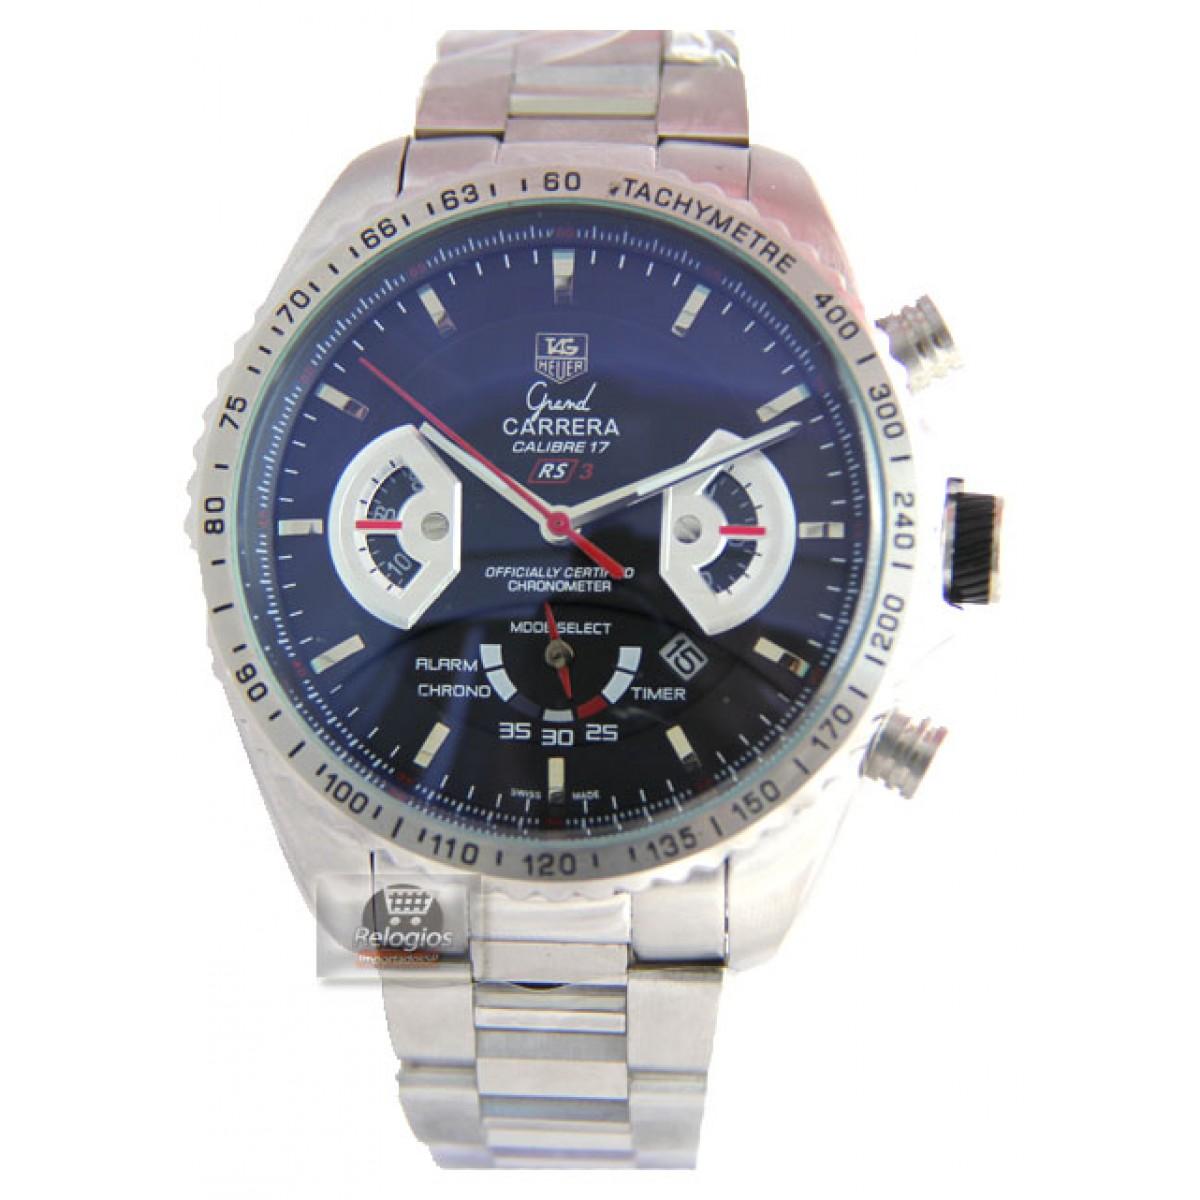 dd92a37c977 Relógio Réplica Tag Heuer Grand Carrera 17 Rs3